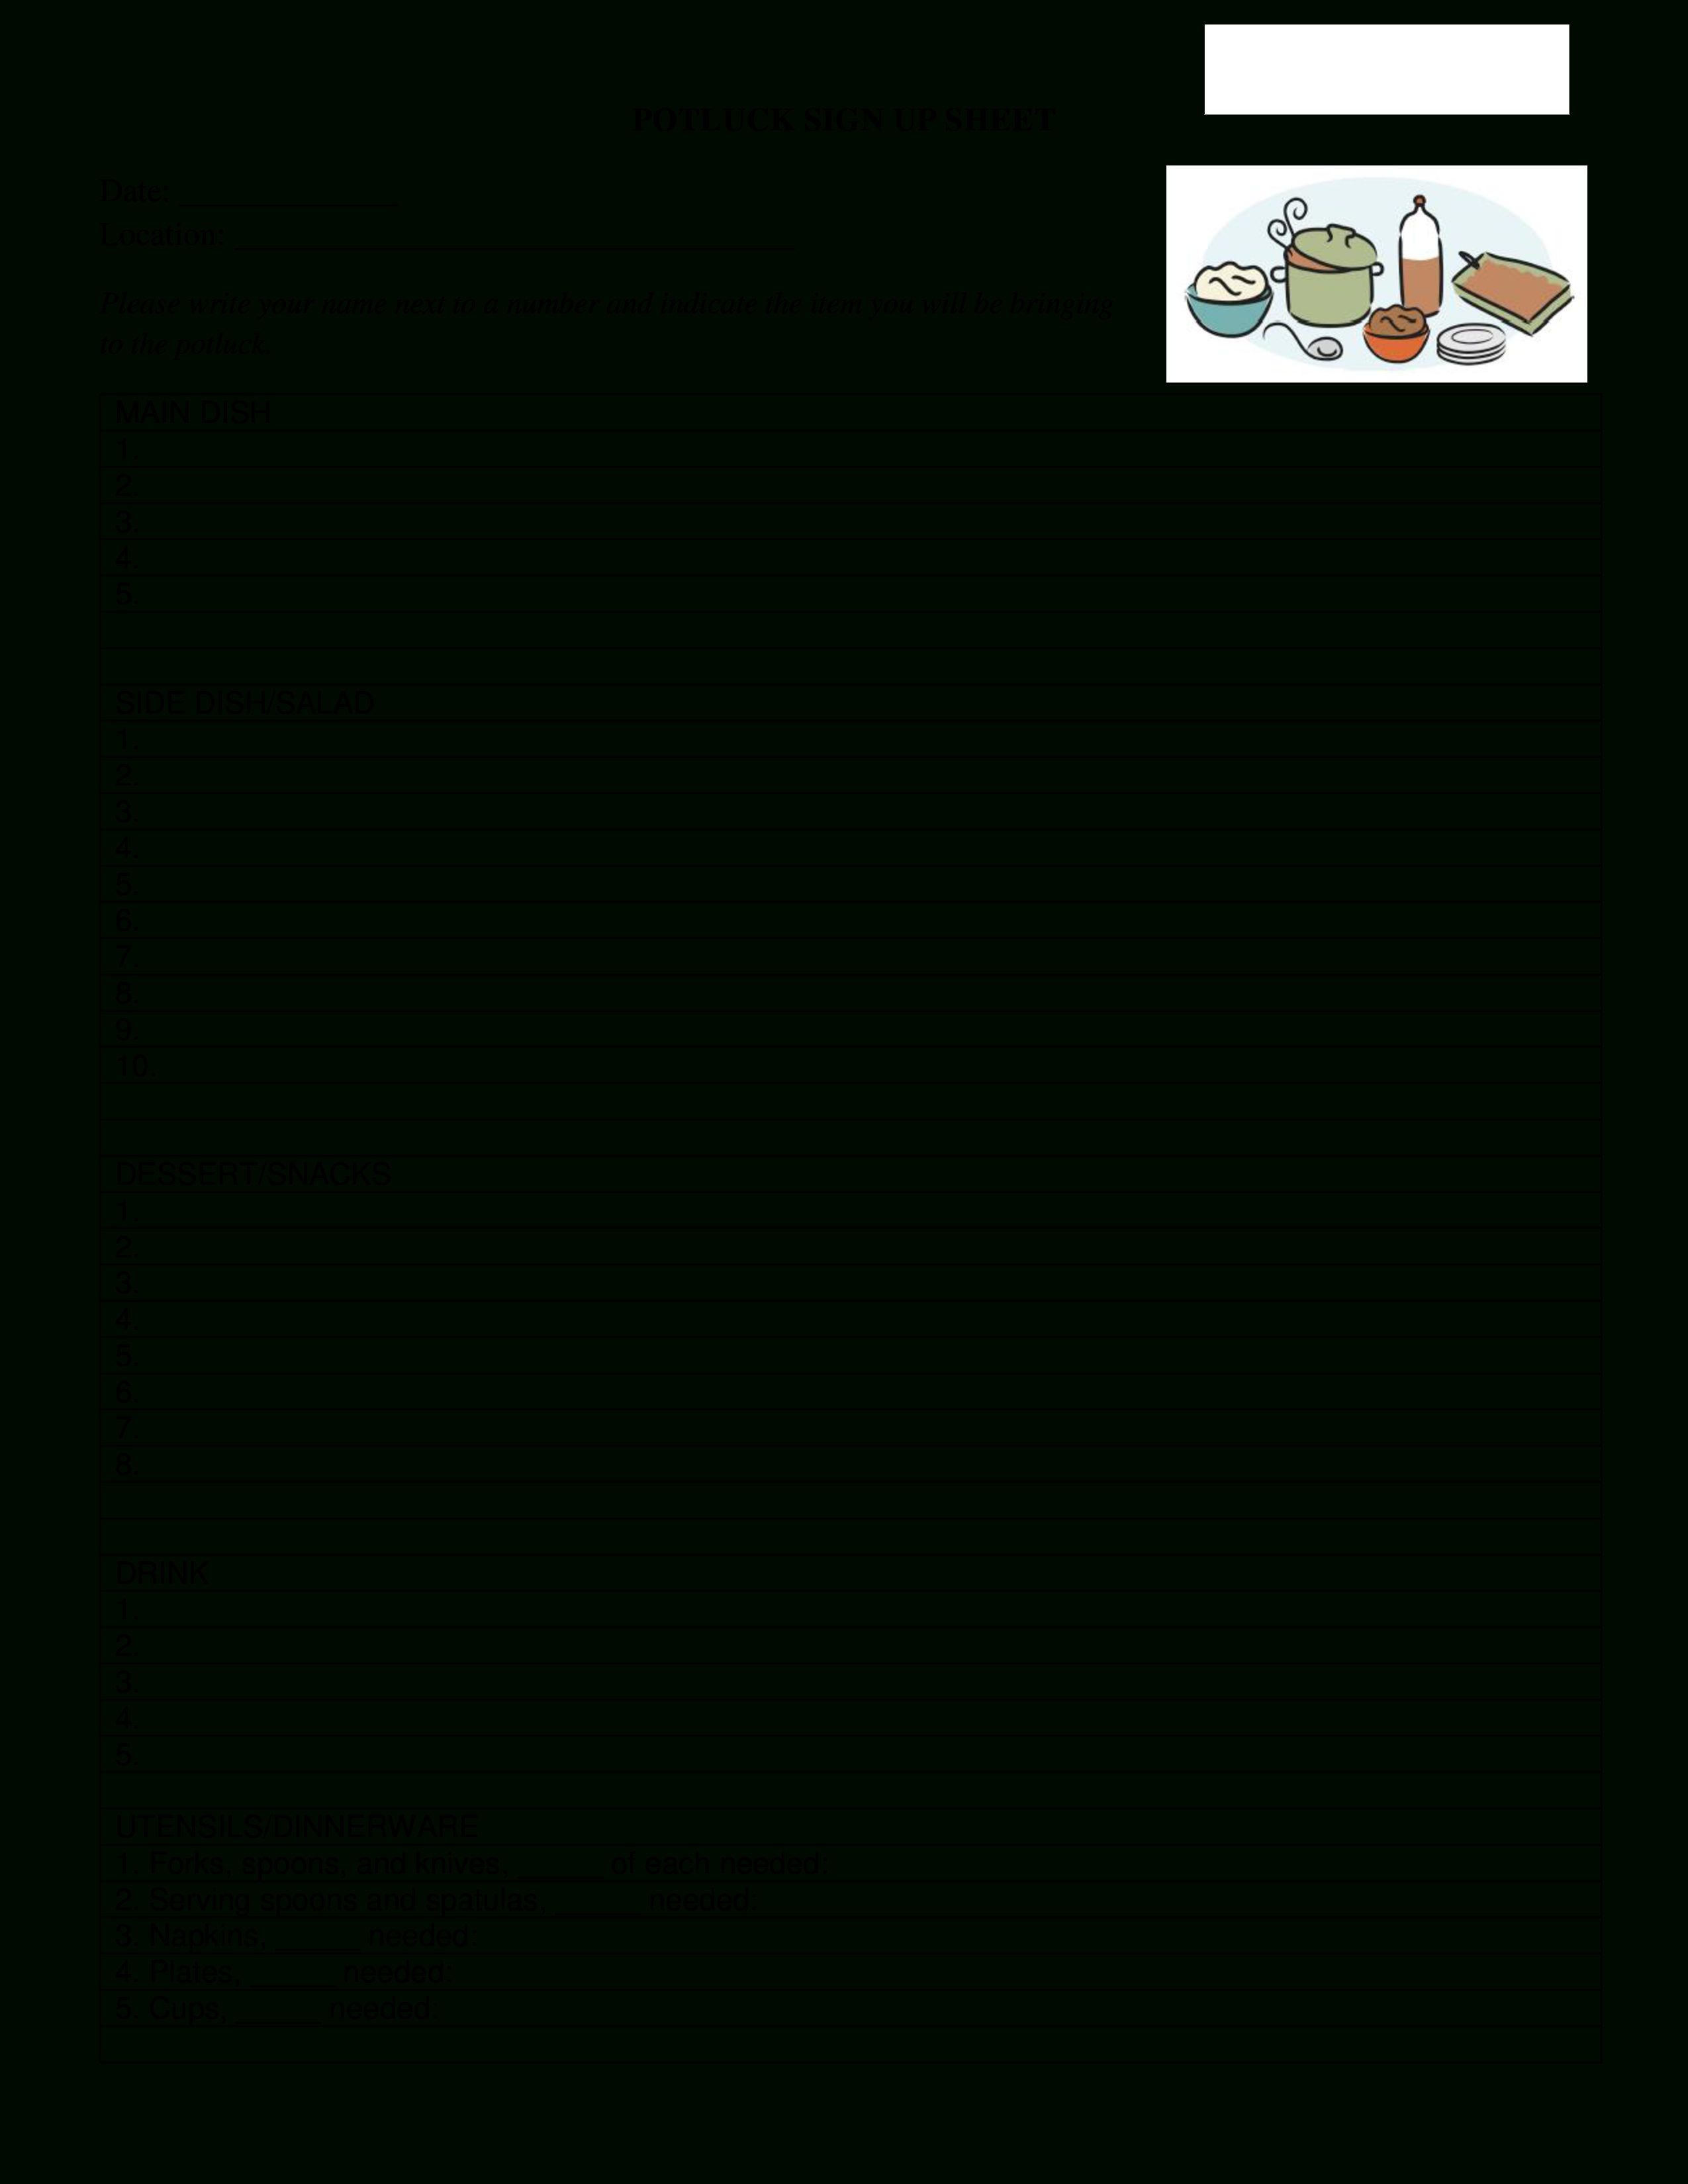 Free Potluck Signup Sheet | Templates At Allbusinesstemplates - Free Printable Sign Up Sheets For Potlucks